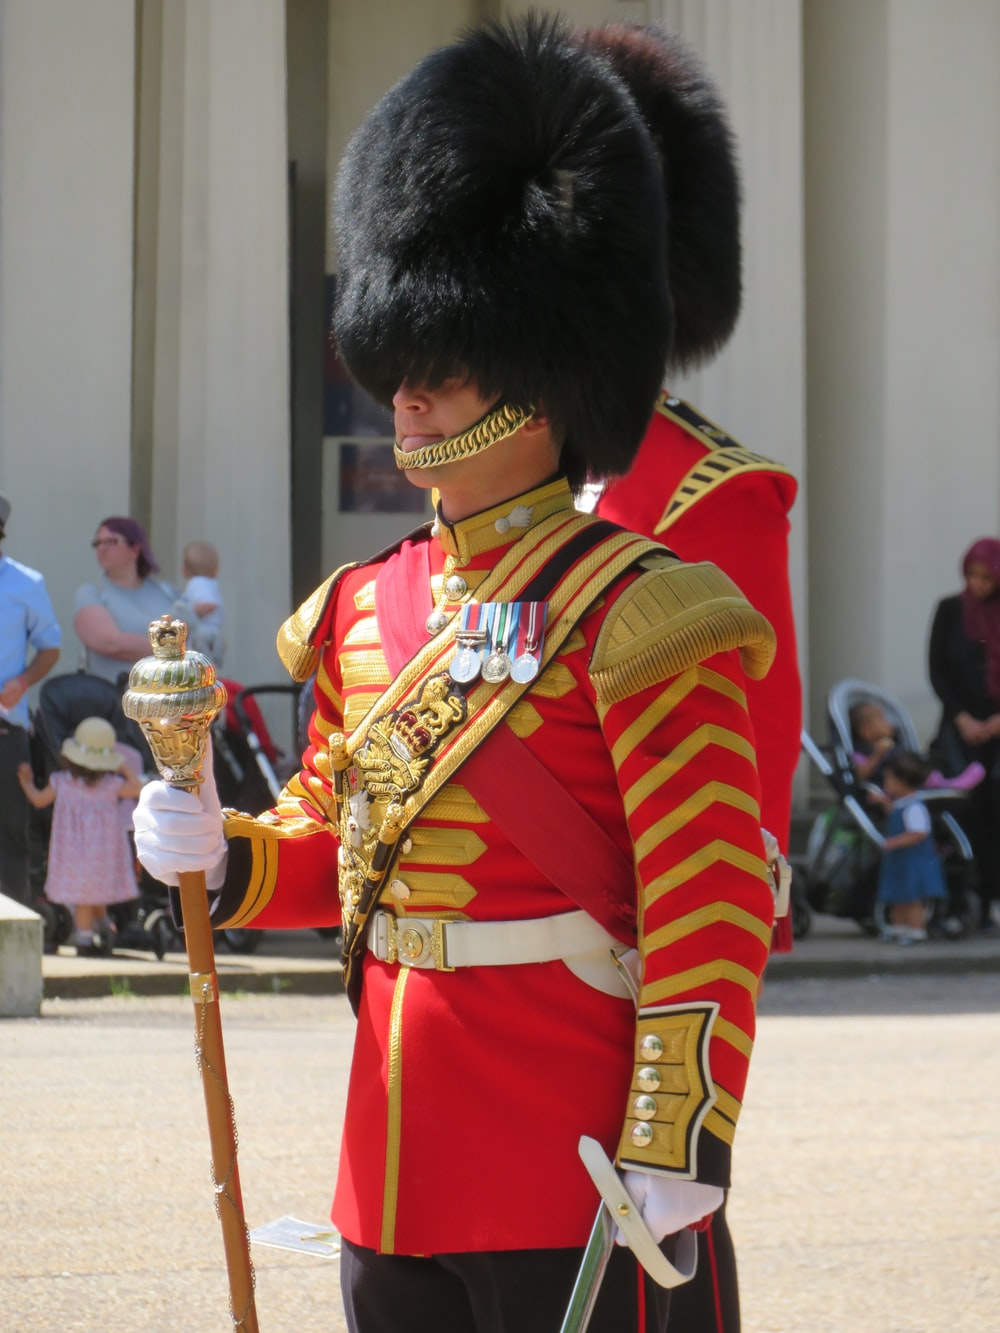 shallow focus photo of Royal guard